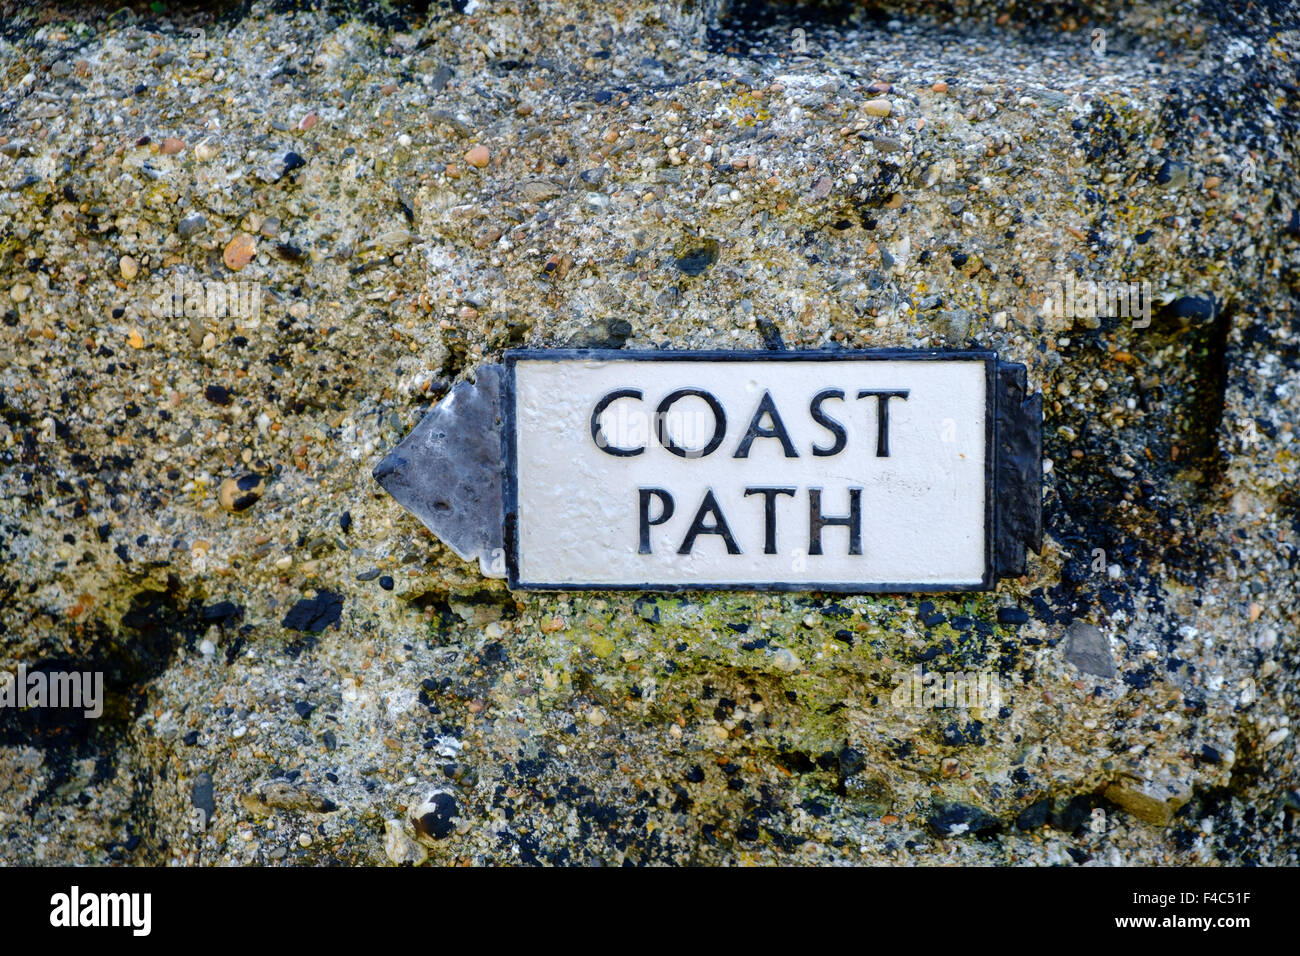 Coast path sign on the South West Coast Path, Lizard Peninsula, Cornwall, England, UK - Stock Image